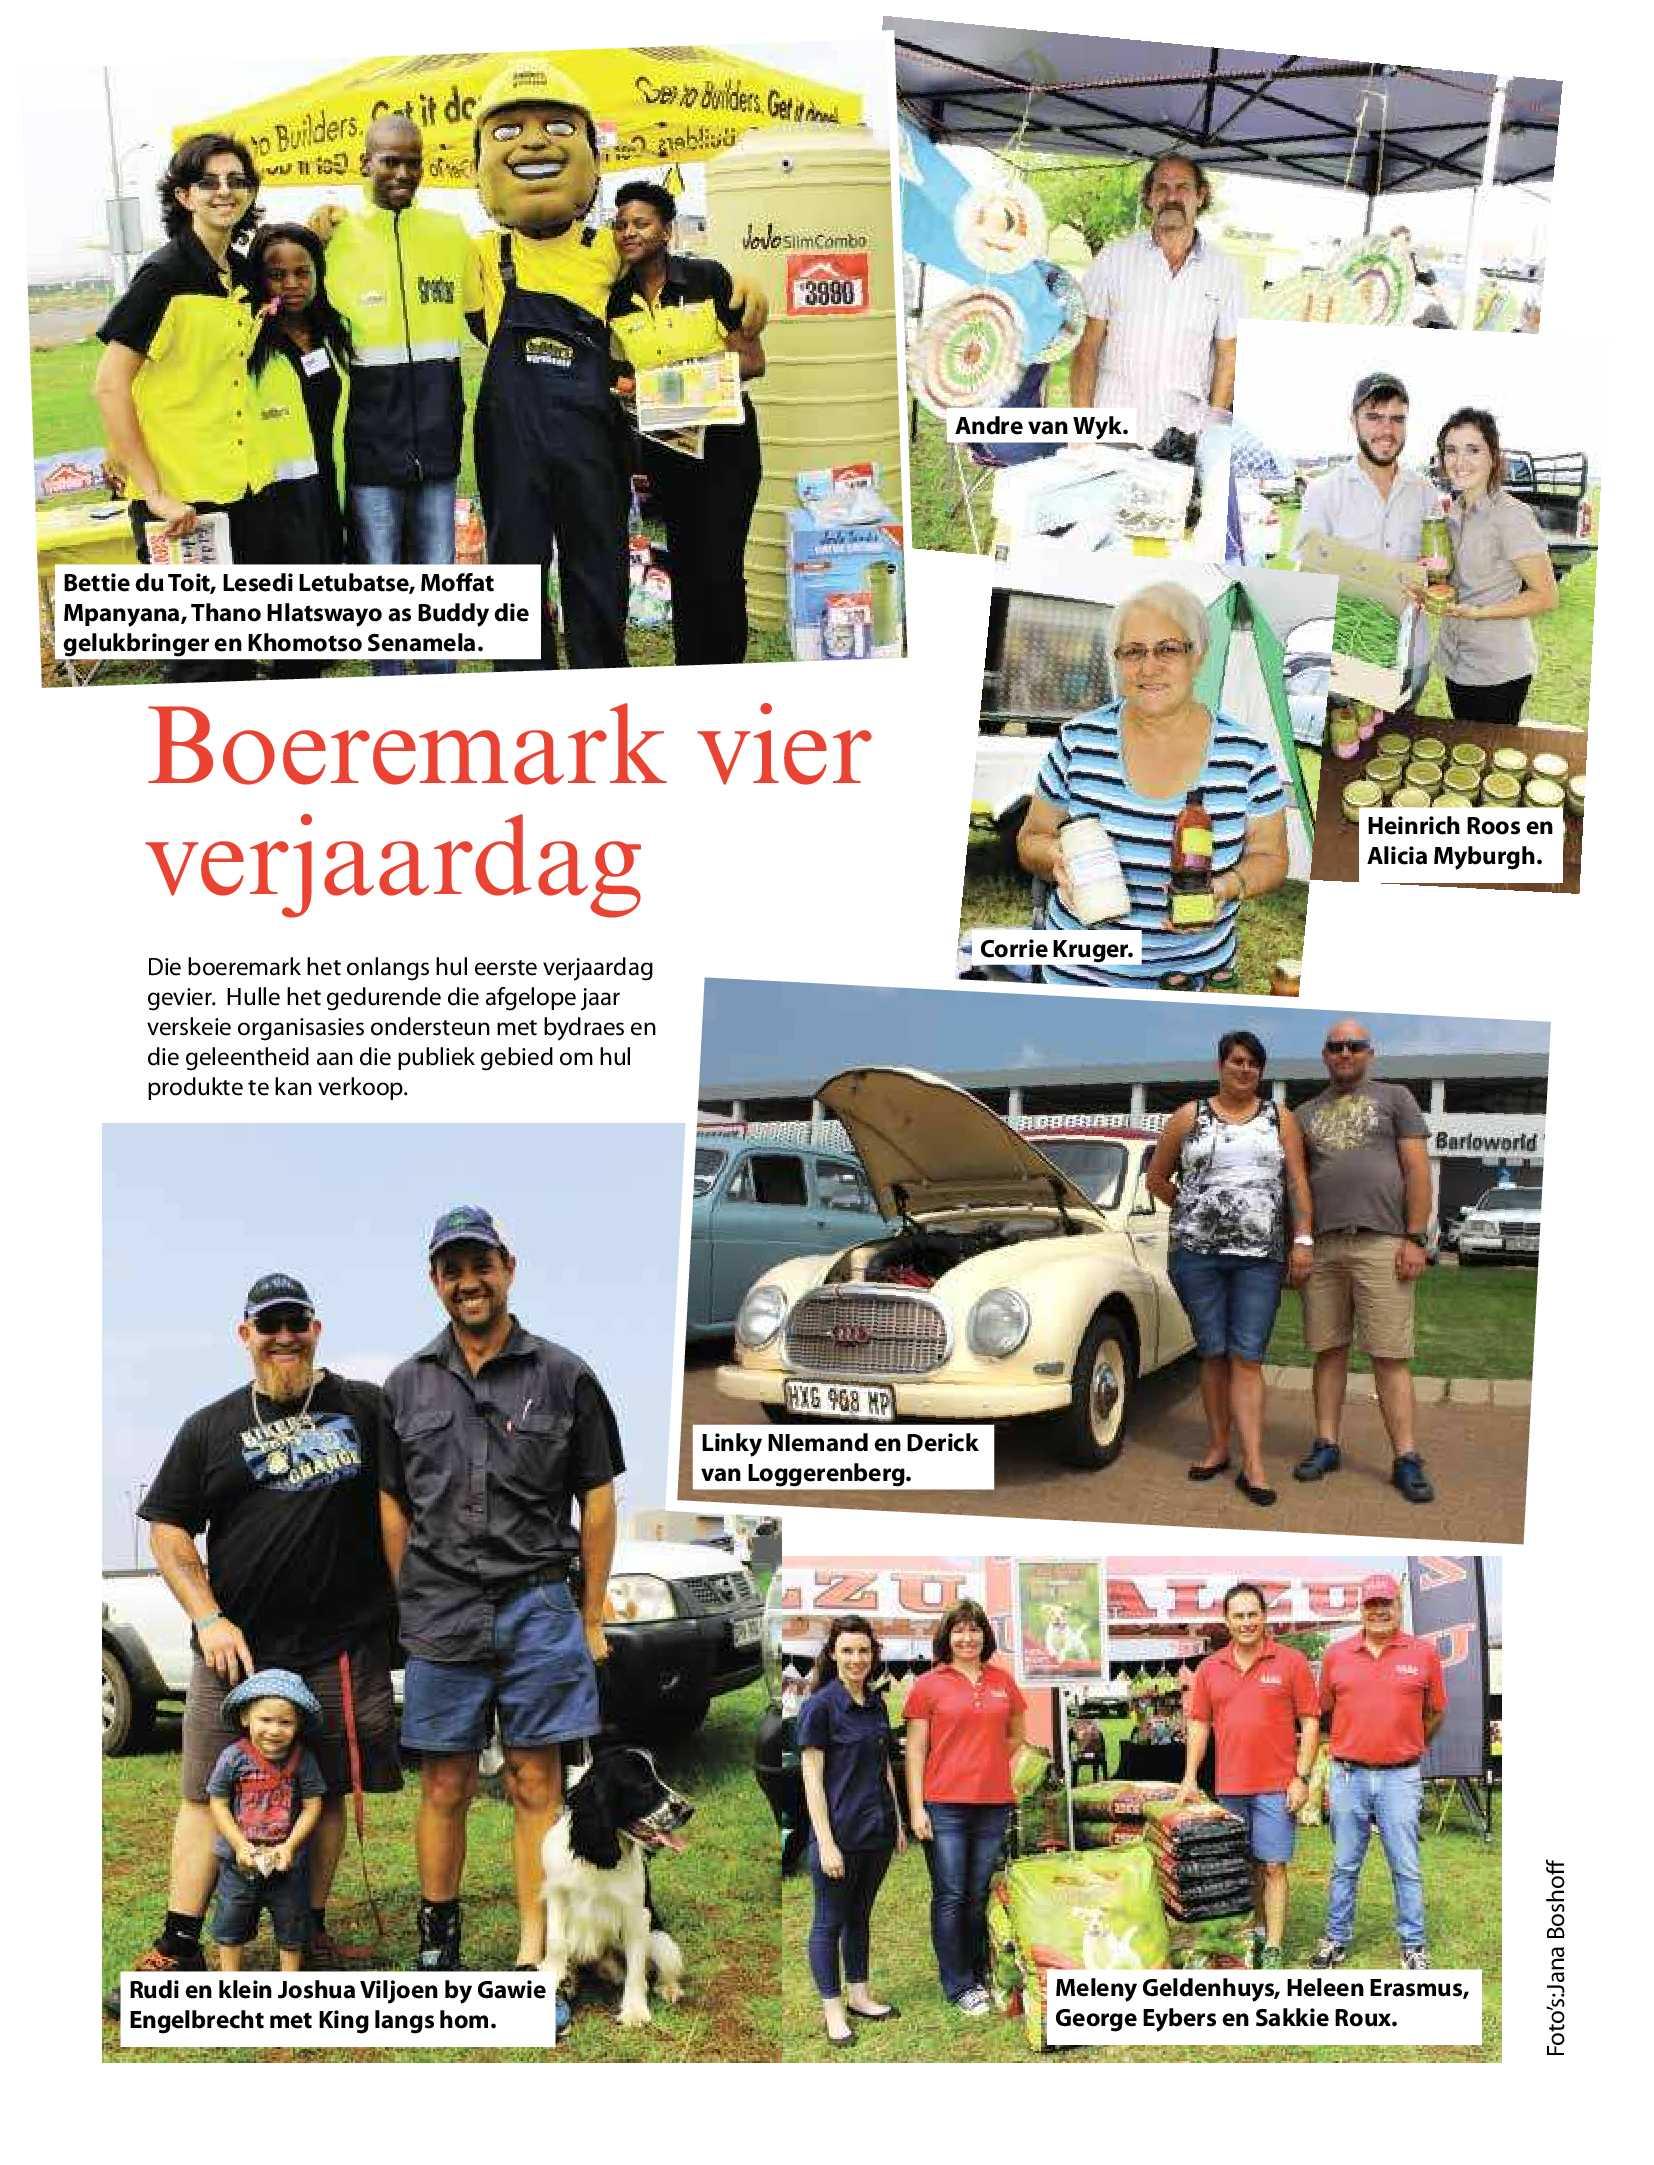 get-middelburg-april-2017-epapers-page-9